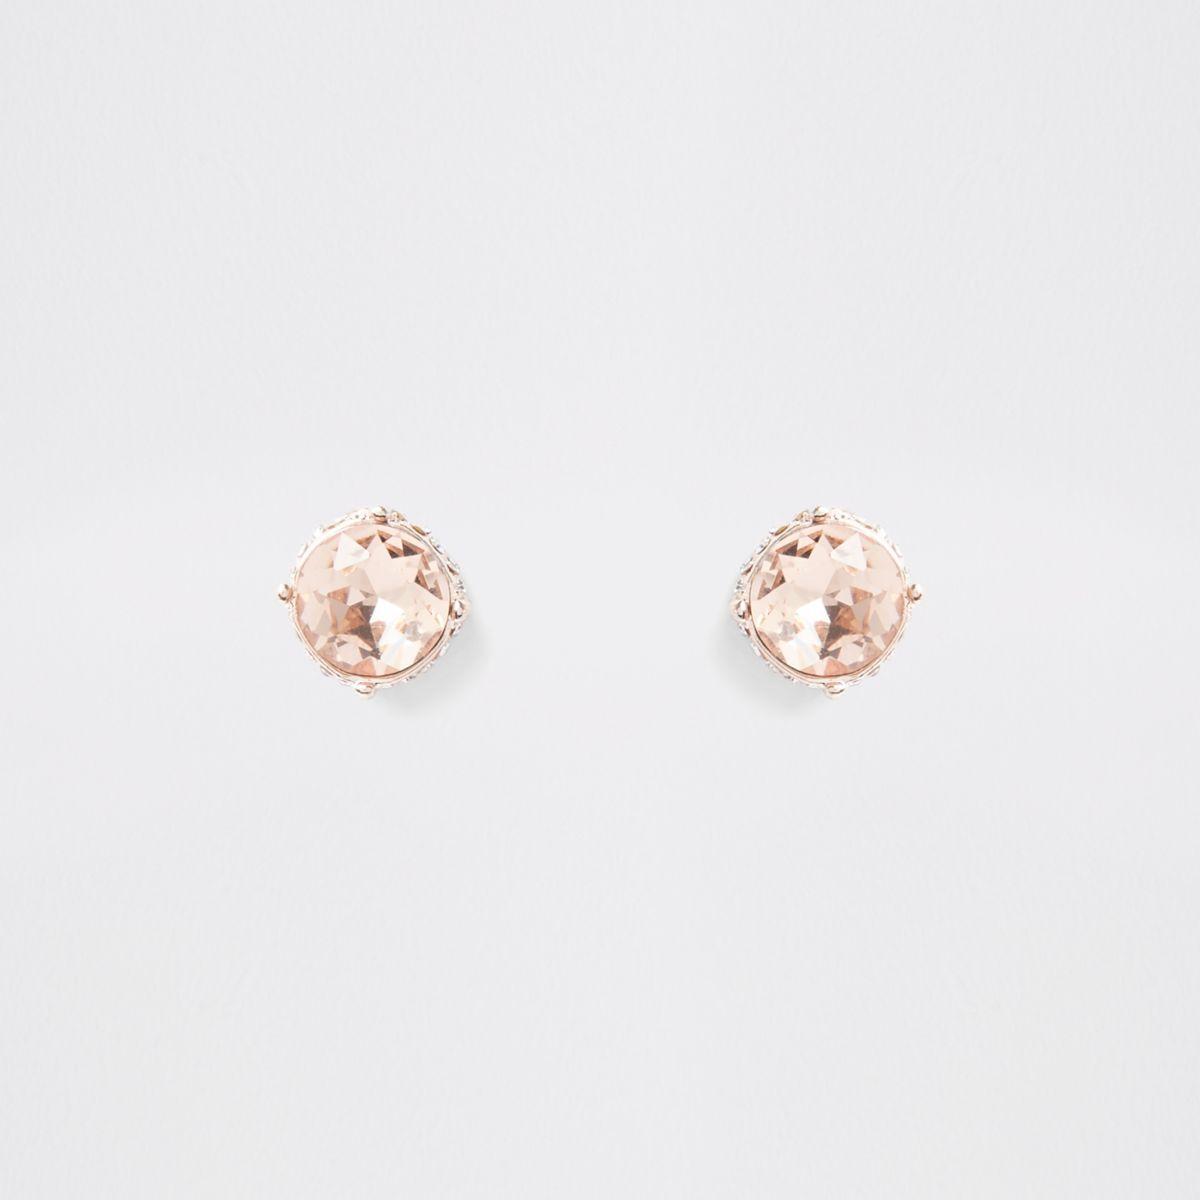 Rose gold jewel stud earrings